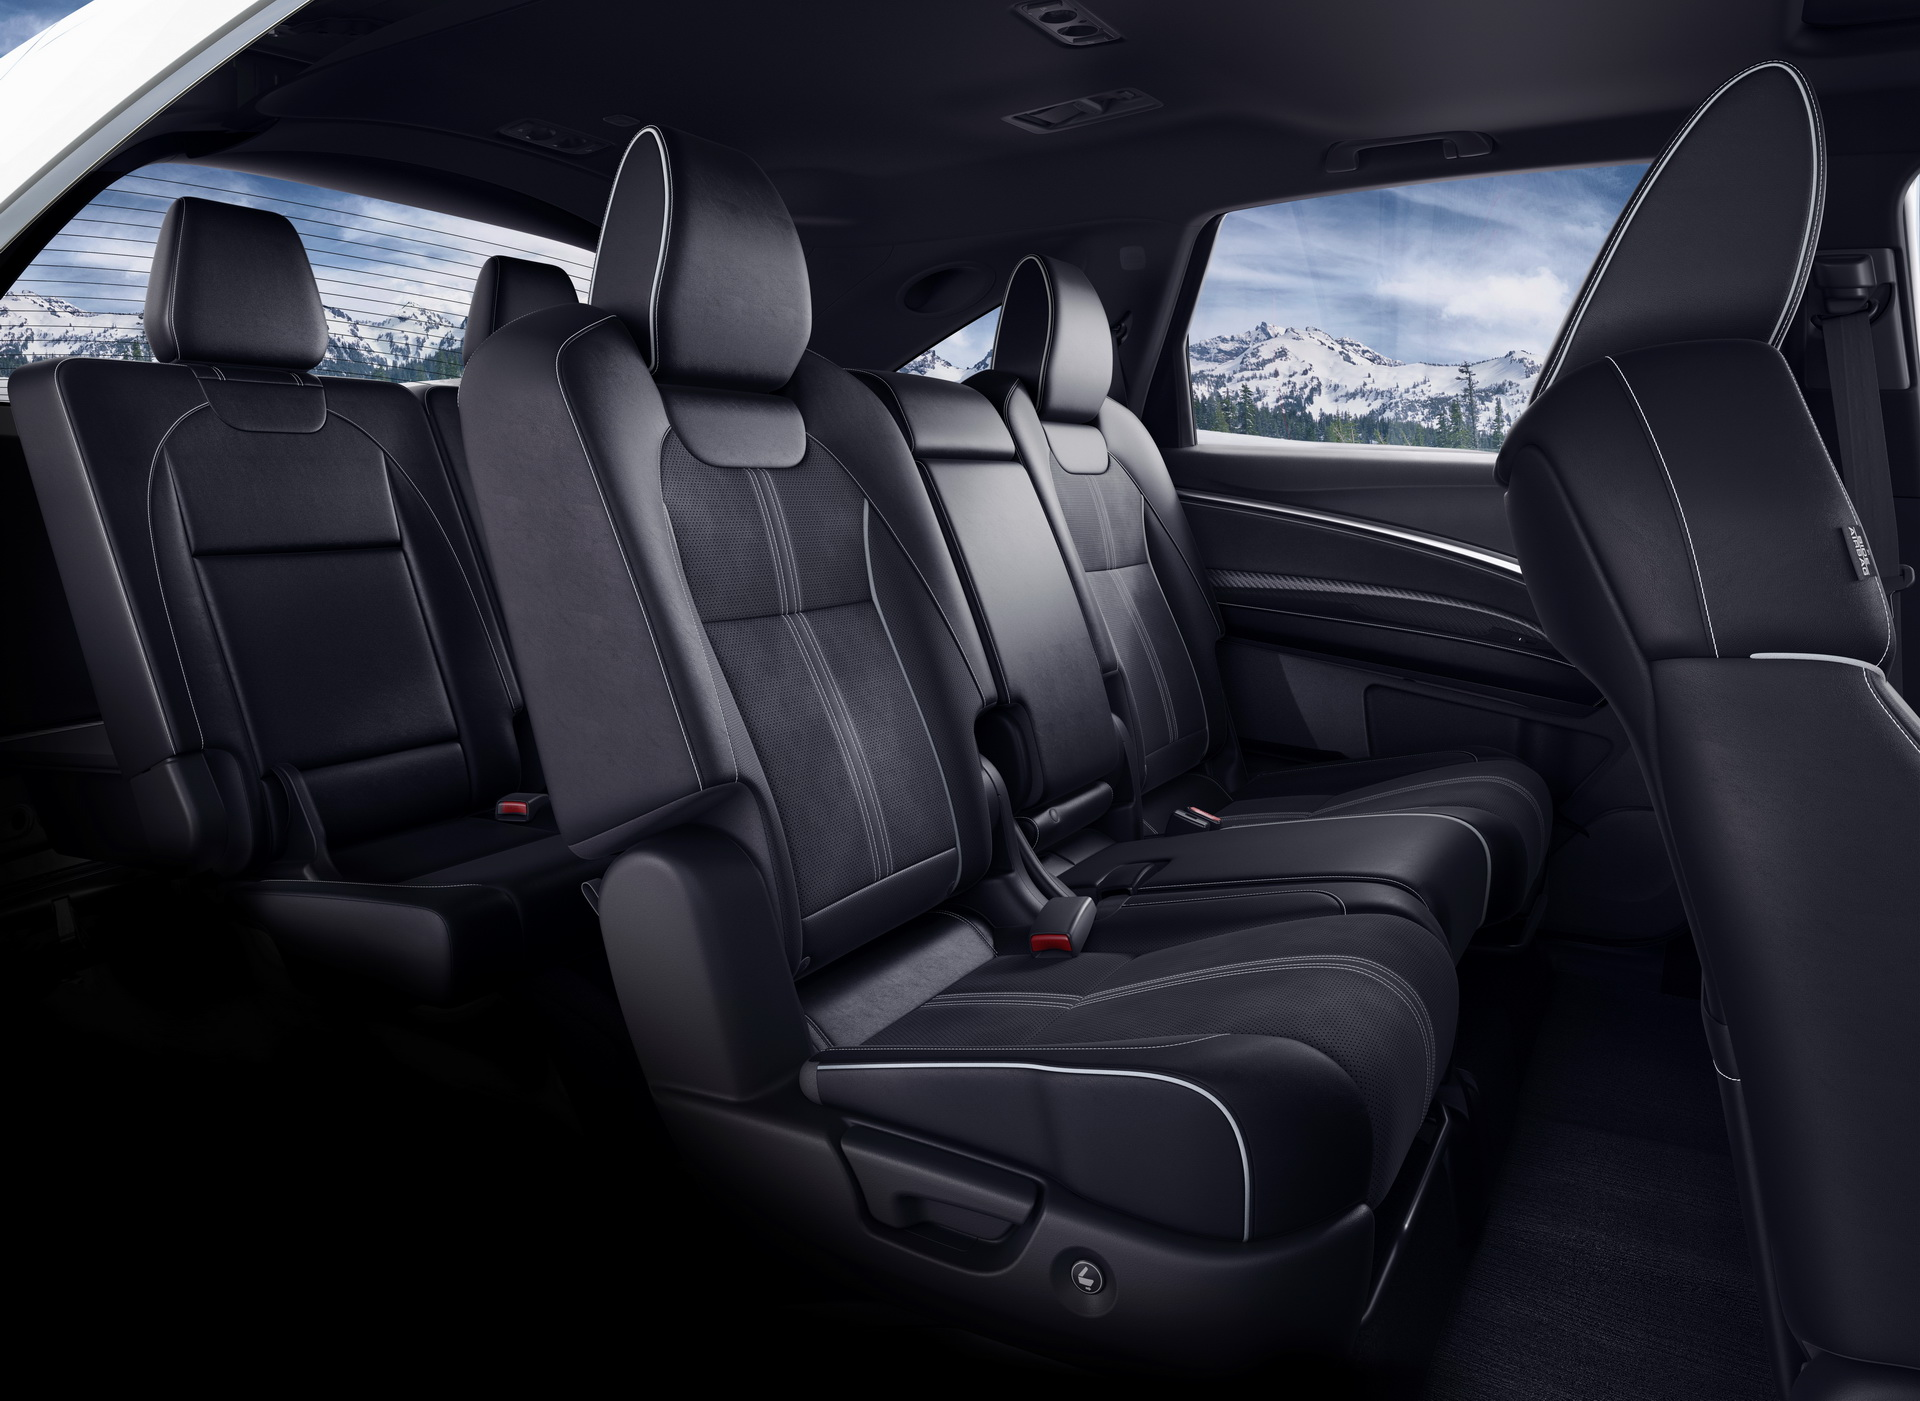 2019-acura-mdx-a-spec-seats